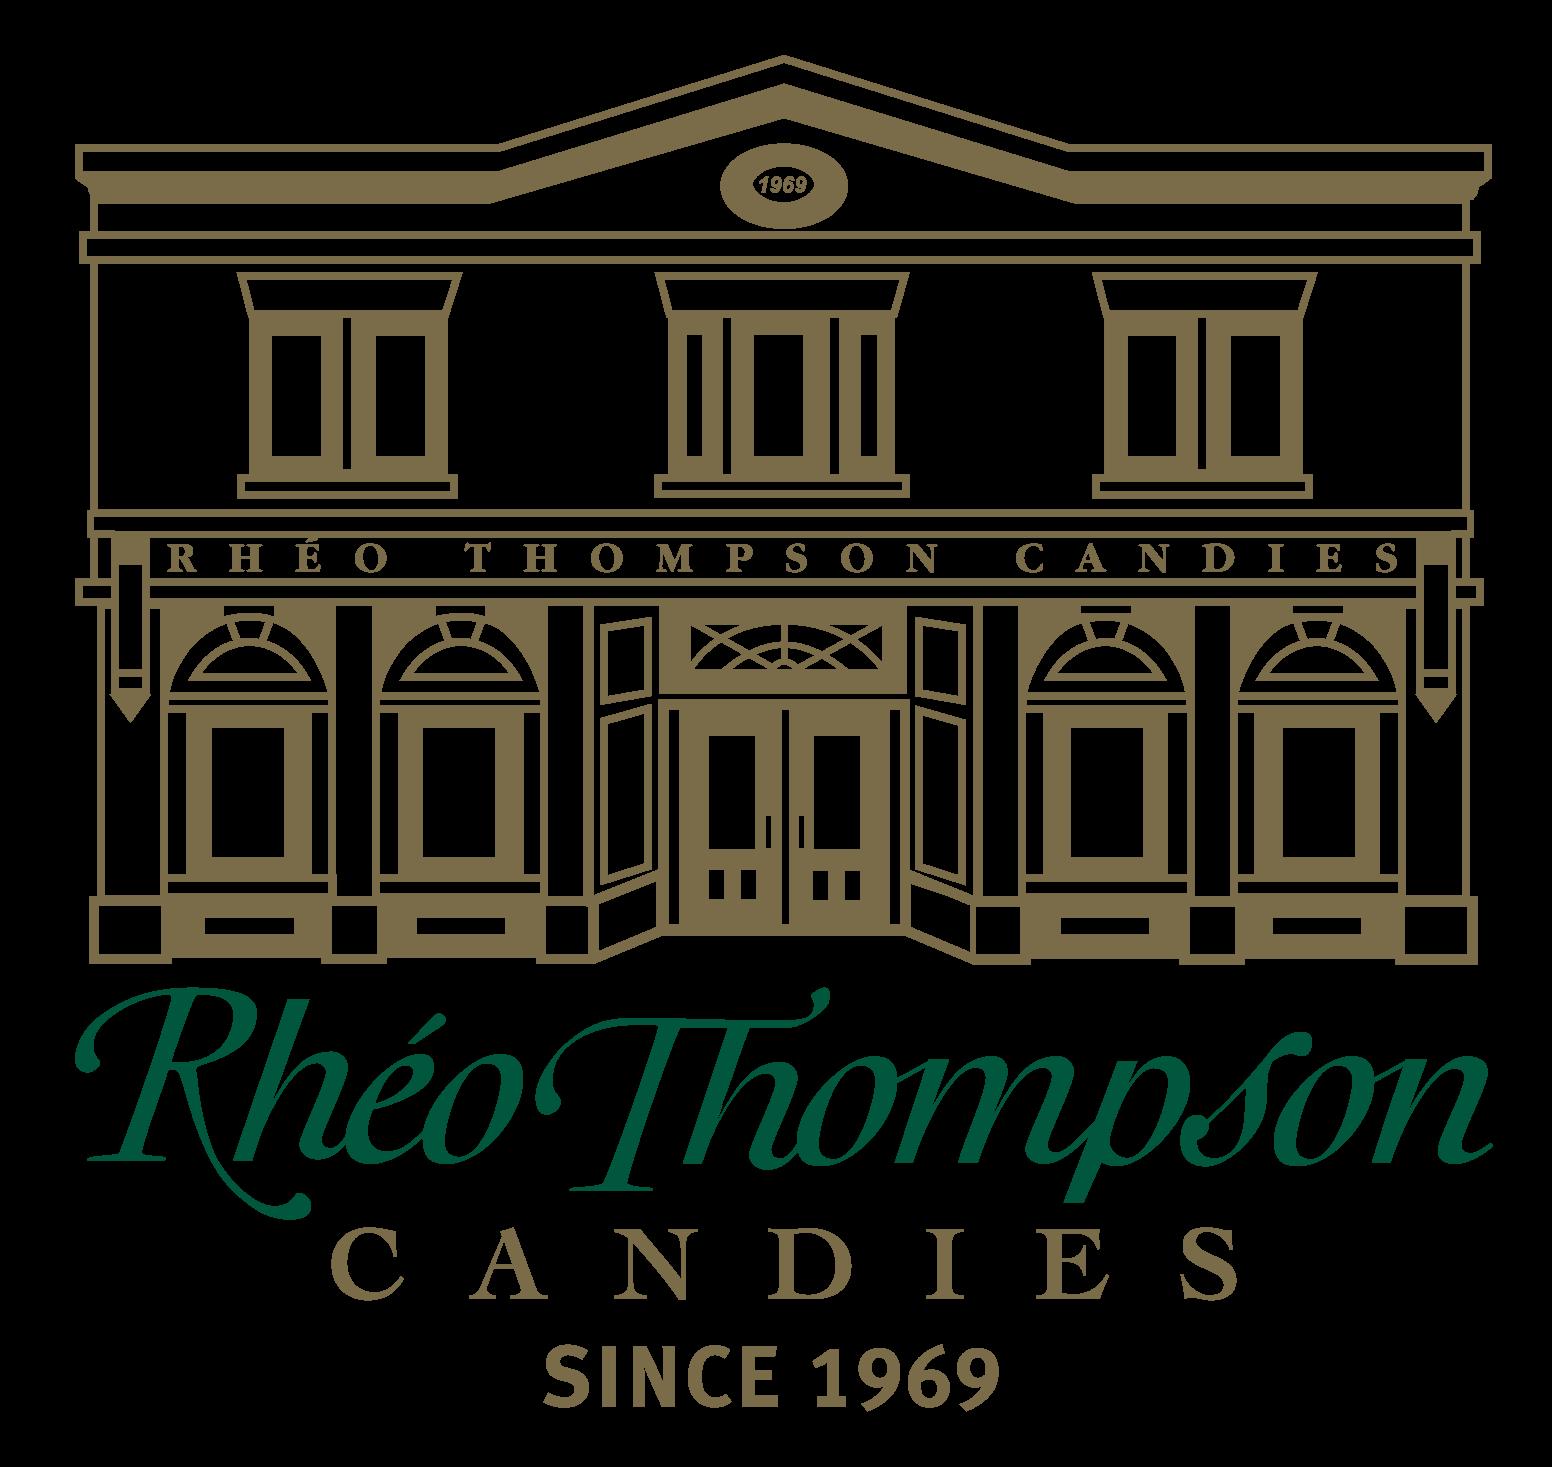 Rheo Thompson Candies logo